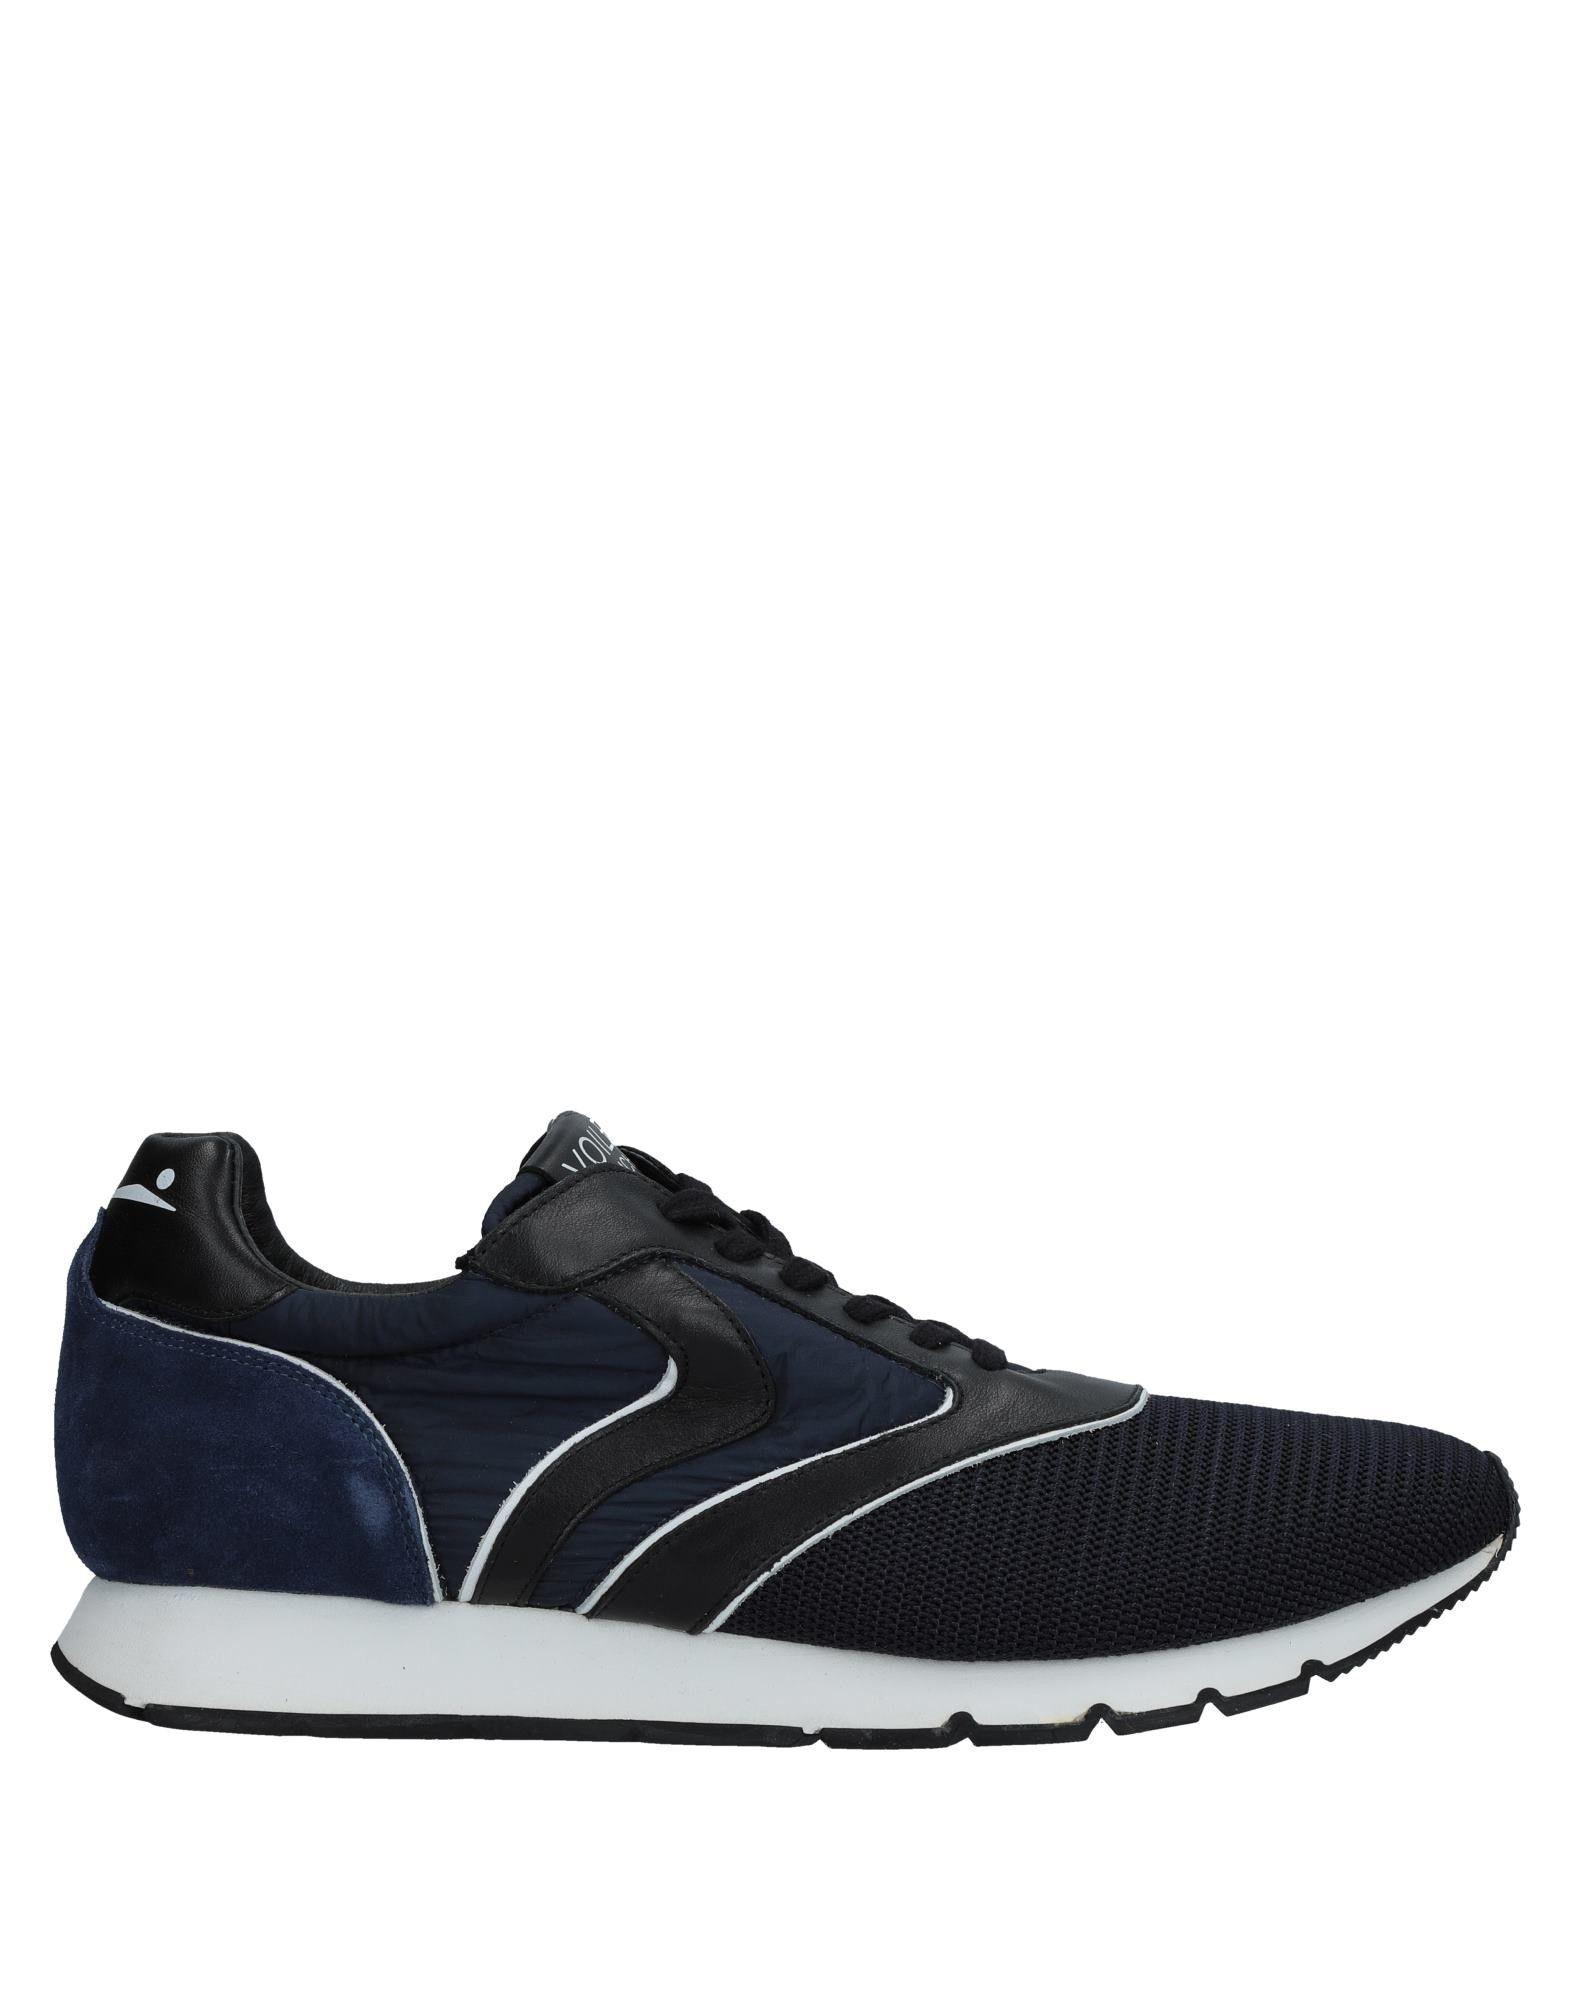 Voile Blanche  Sneakers Herren  Blanche 11384987KX b5f41a